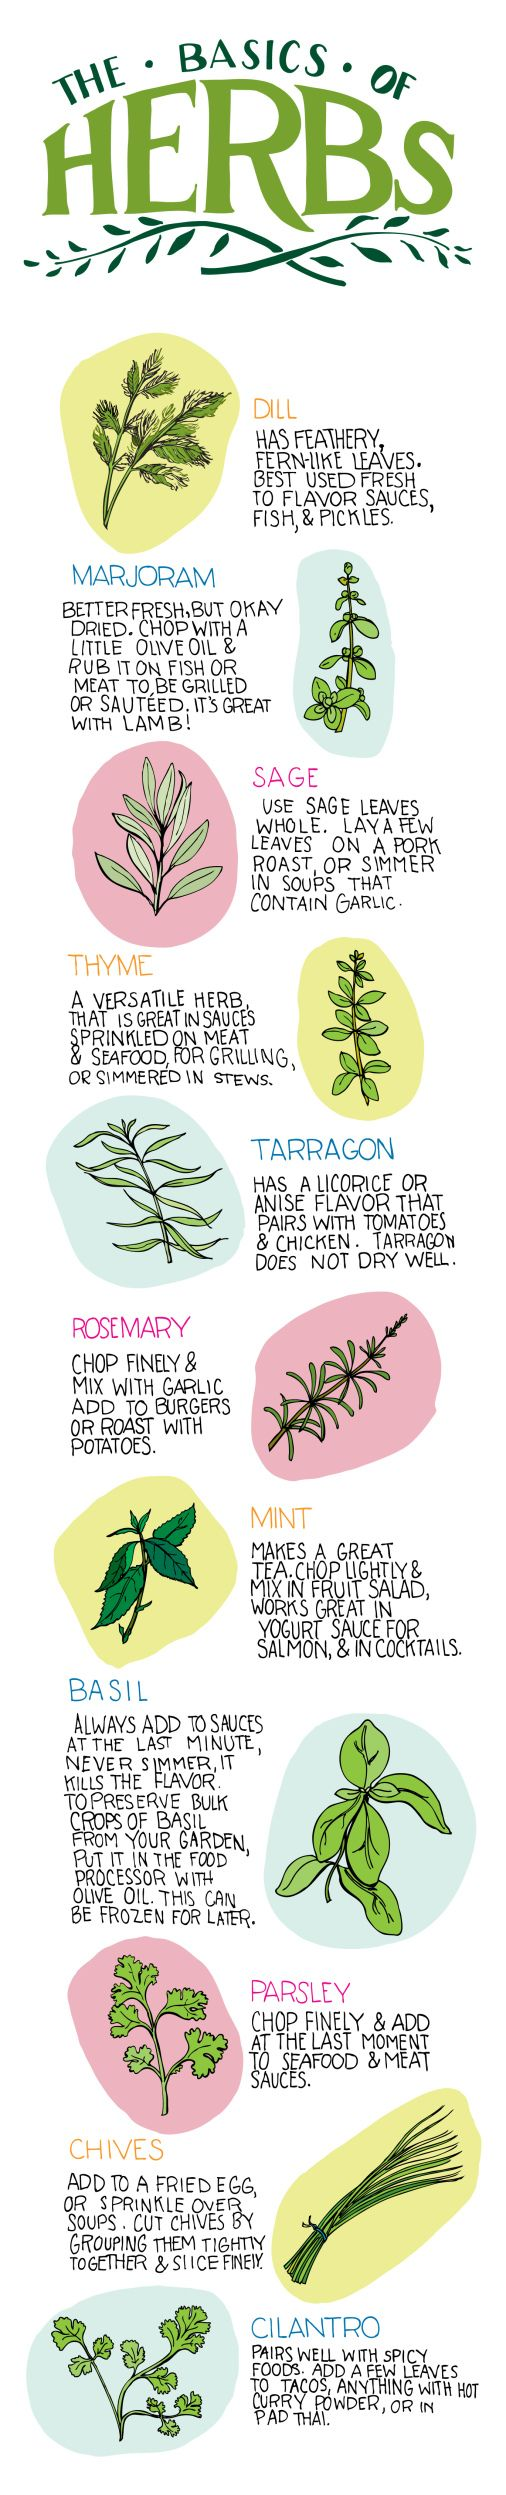 The basics of herbs....